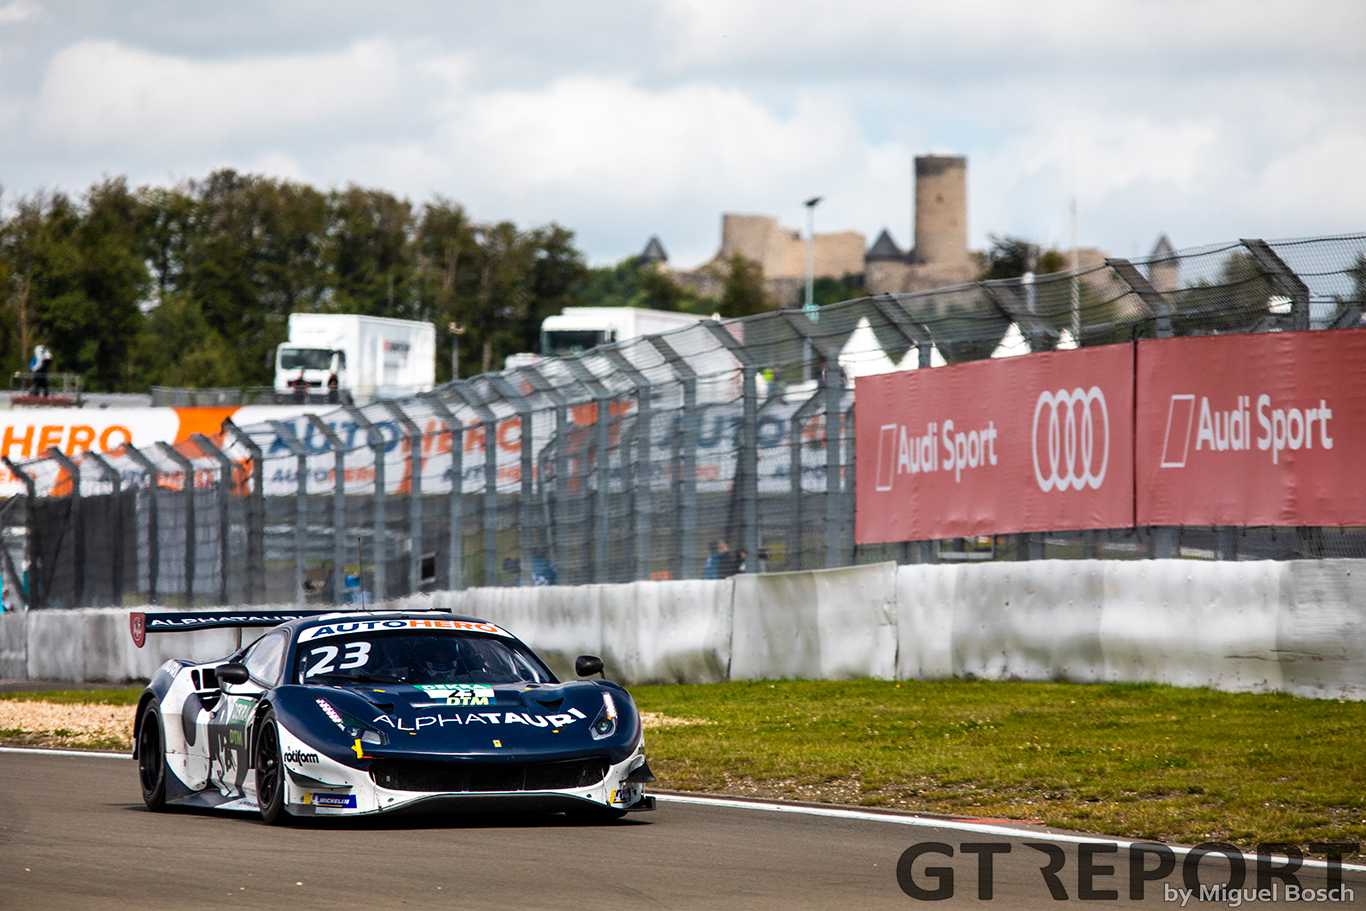 DTM Nürburgring race 2 report: Albon takes lights to flag debut victory